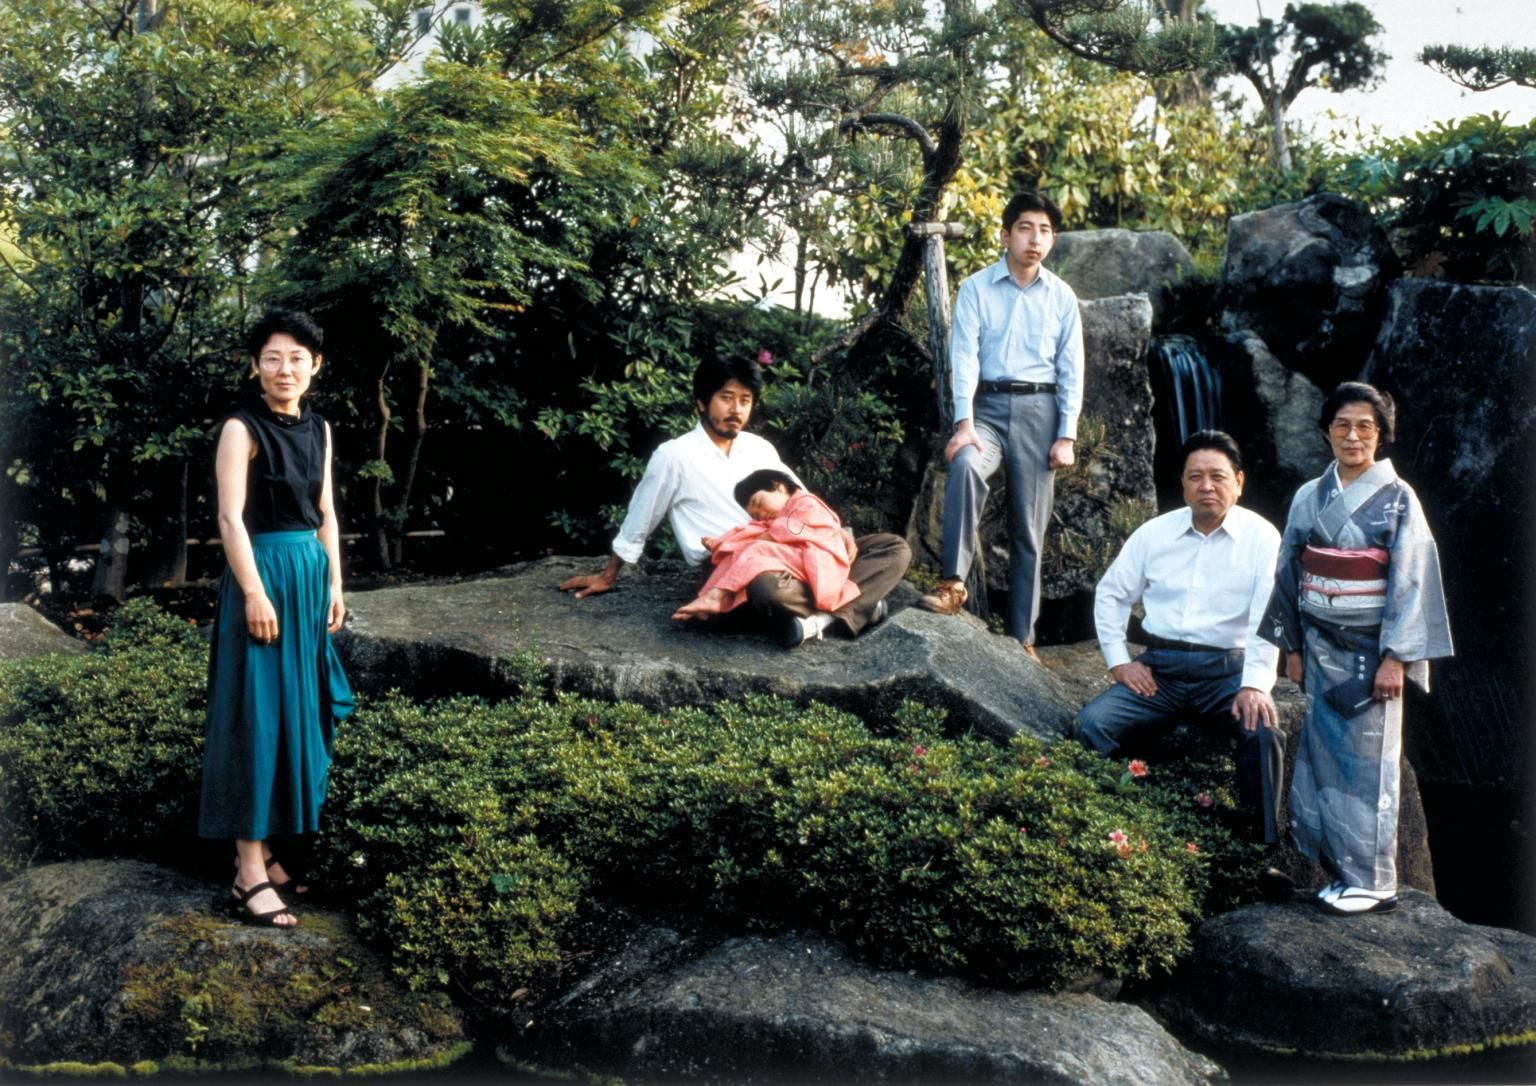 Thomas Struth, 'The Shimada Family, Yamaguchi, Japan 1986' 1986